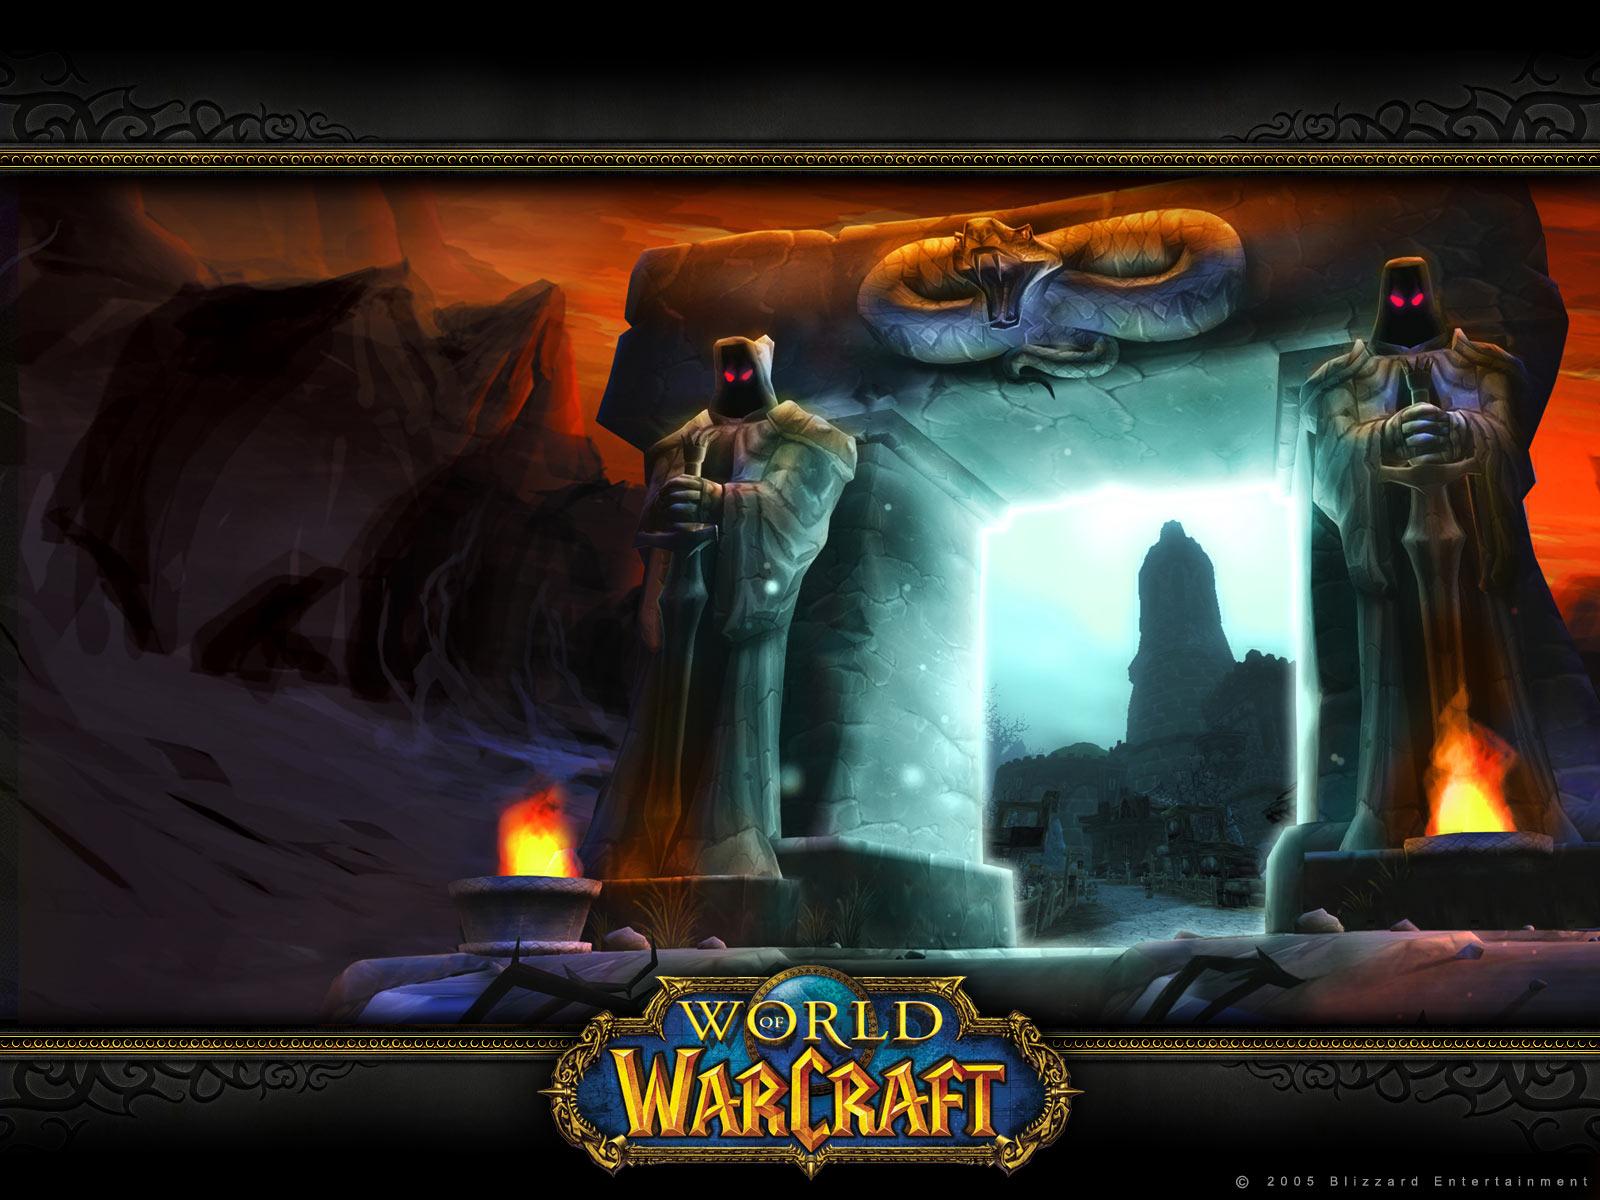 Darknest world of warcraft nude clips